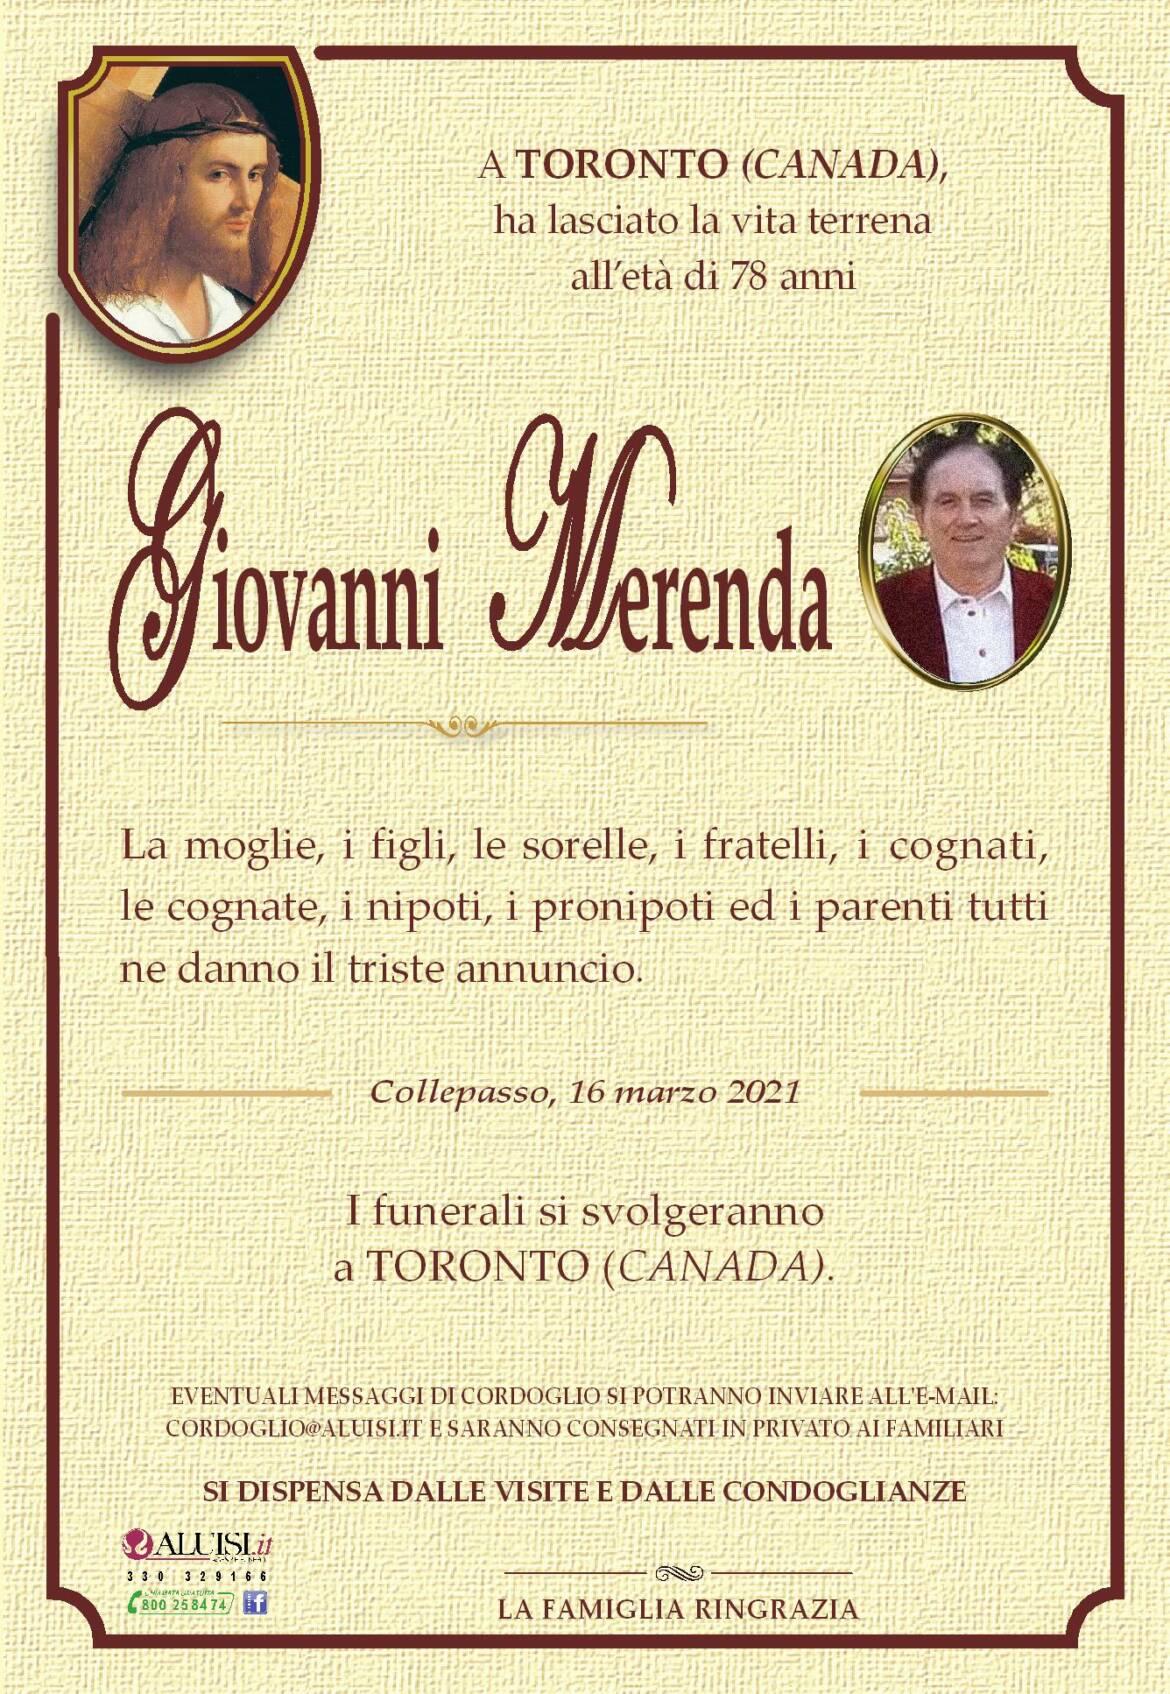 Annuncio-GIOVANNI-MERENDA-TORONTO.jpg